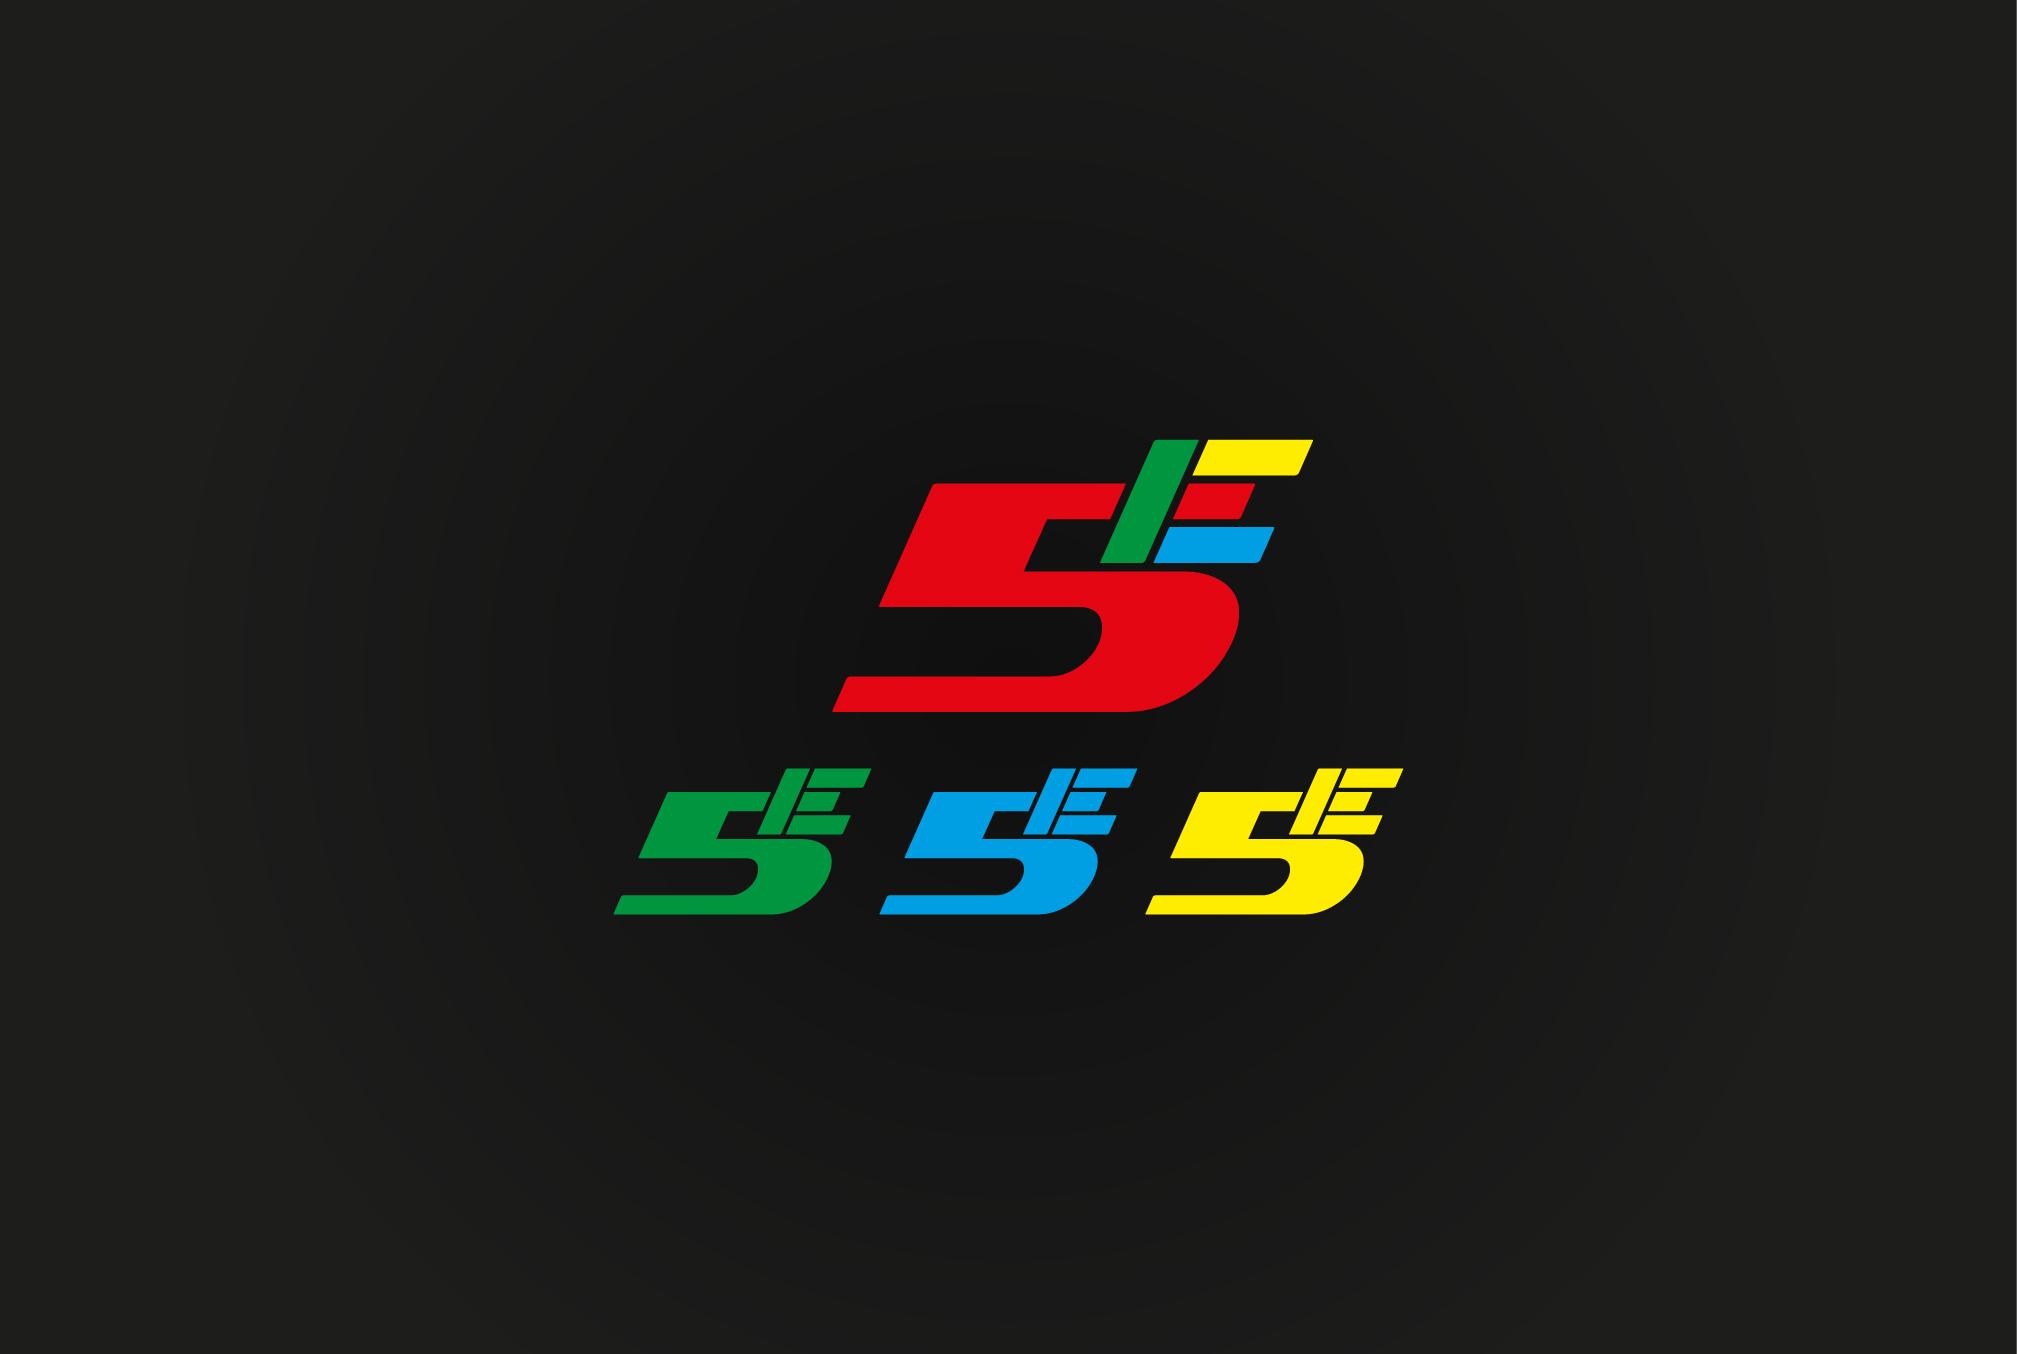 Нарисовать логотип для группы компаний  фото f_8645cdba481b9146.jpg